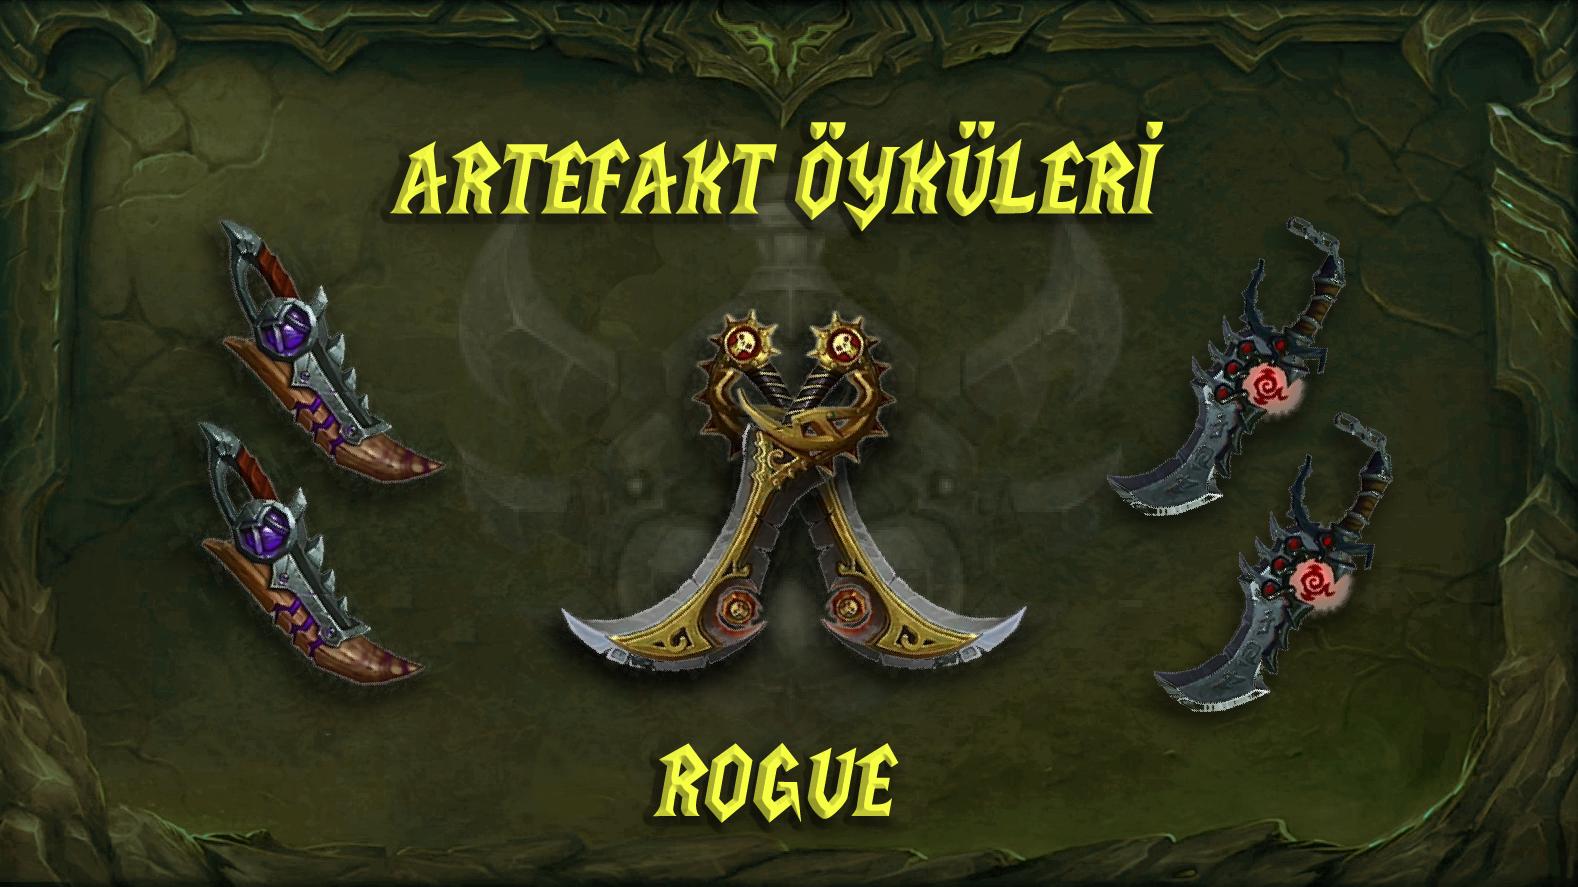 lorekeeper-artefakt-oykuleri-rogue